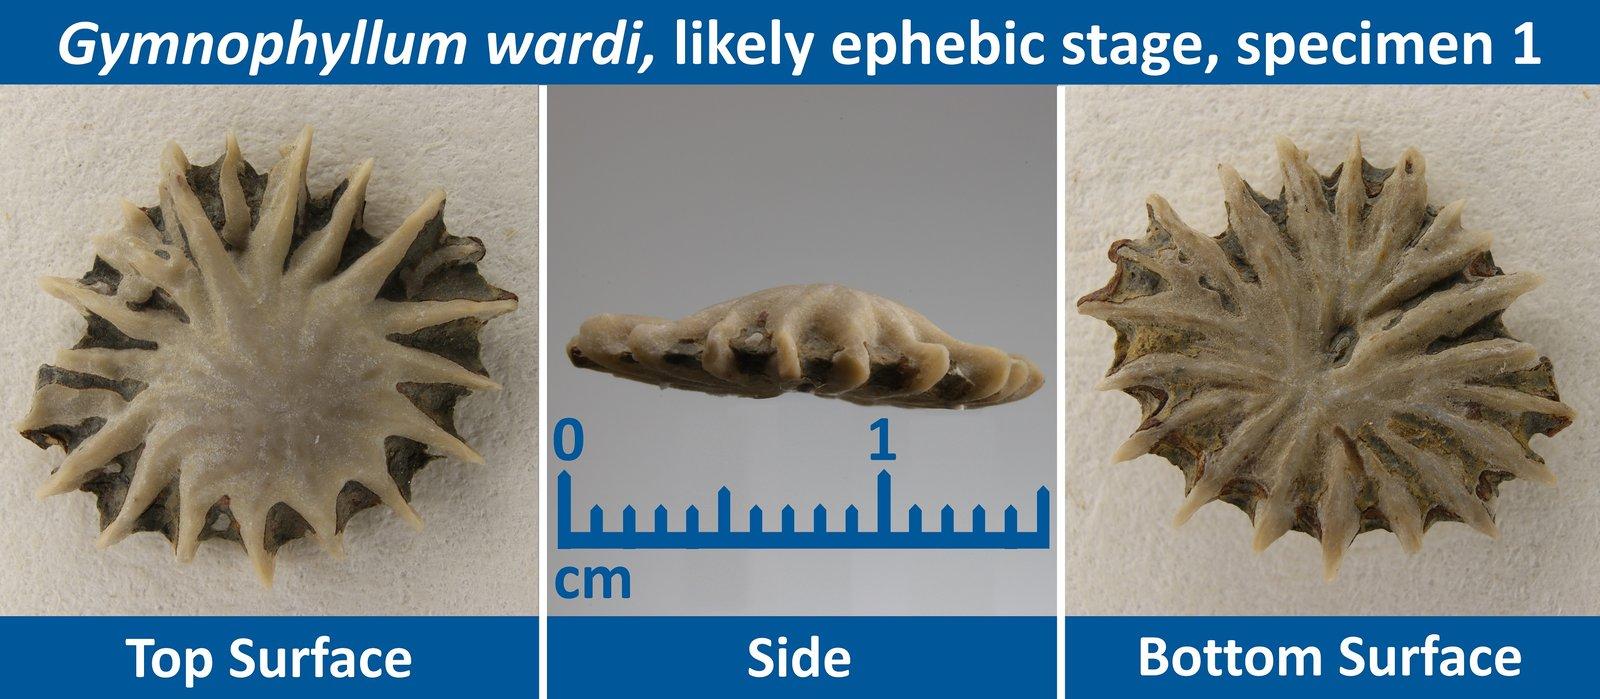 03 Gymnophyllum wardi Ephebic Specimen 01.jpg